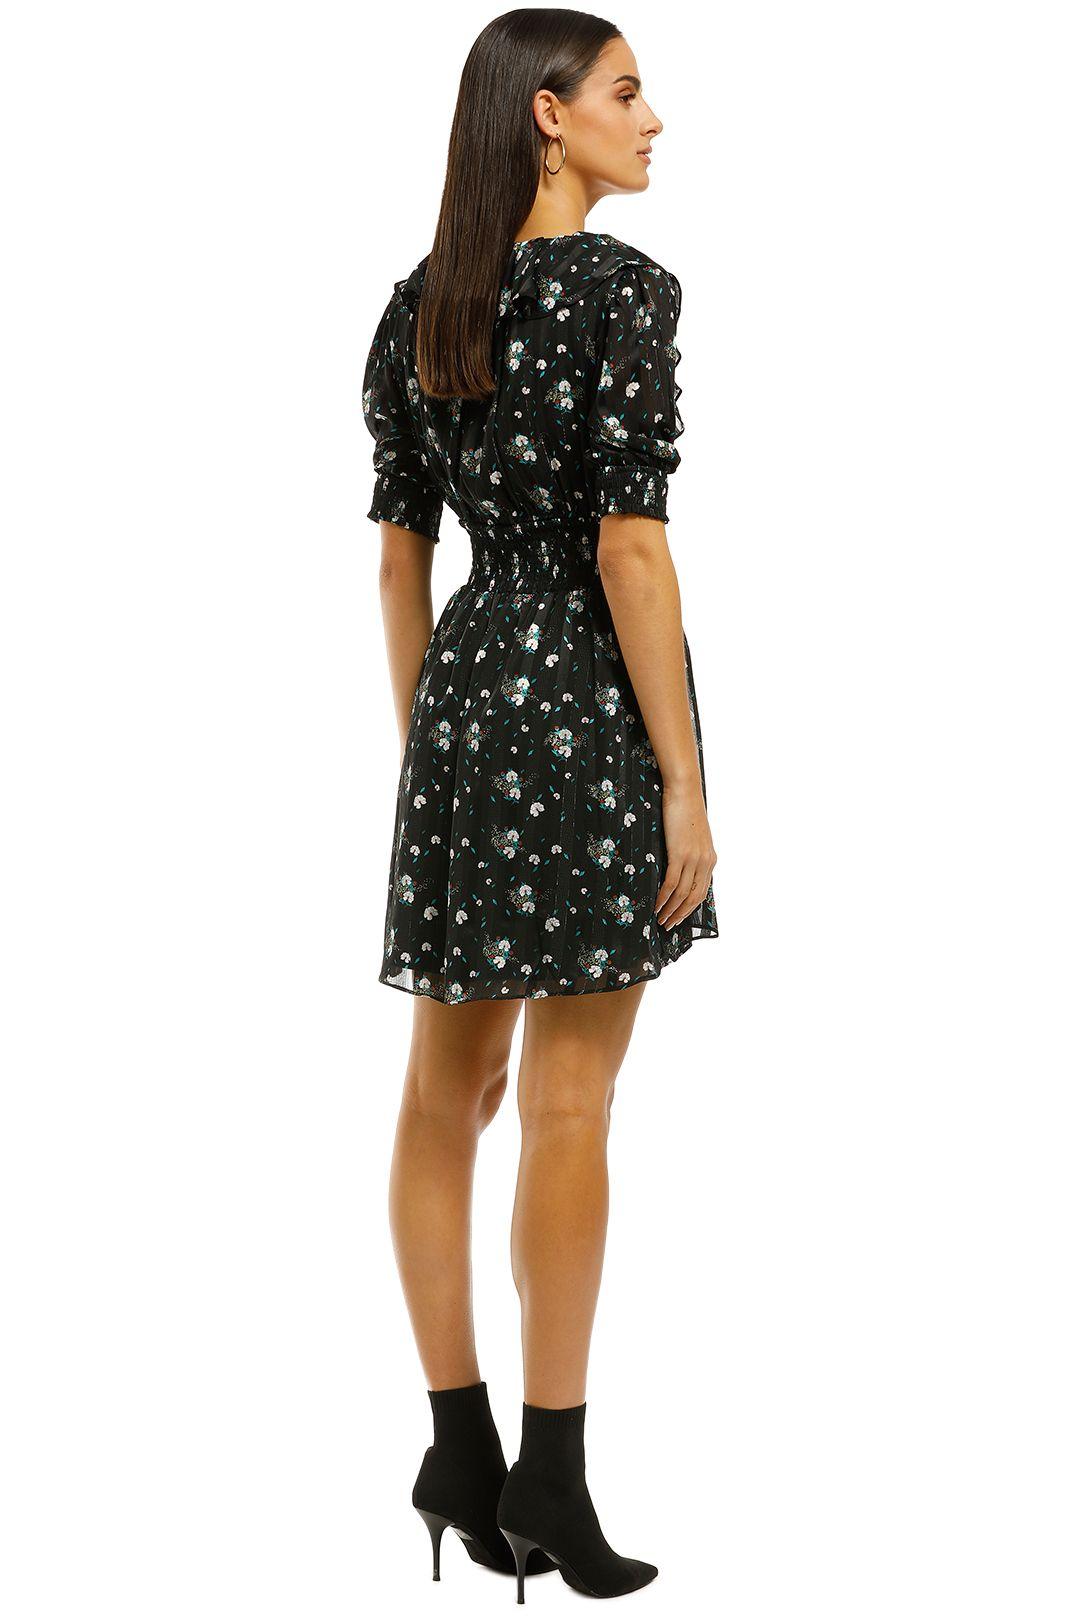 Elliatt - Posy Dress - Black Floral - Back